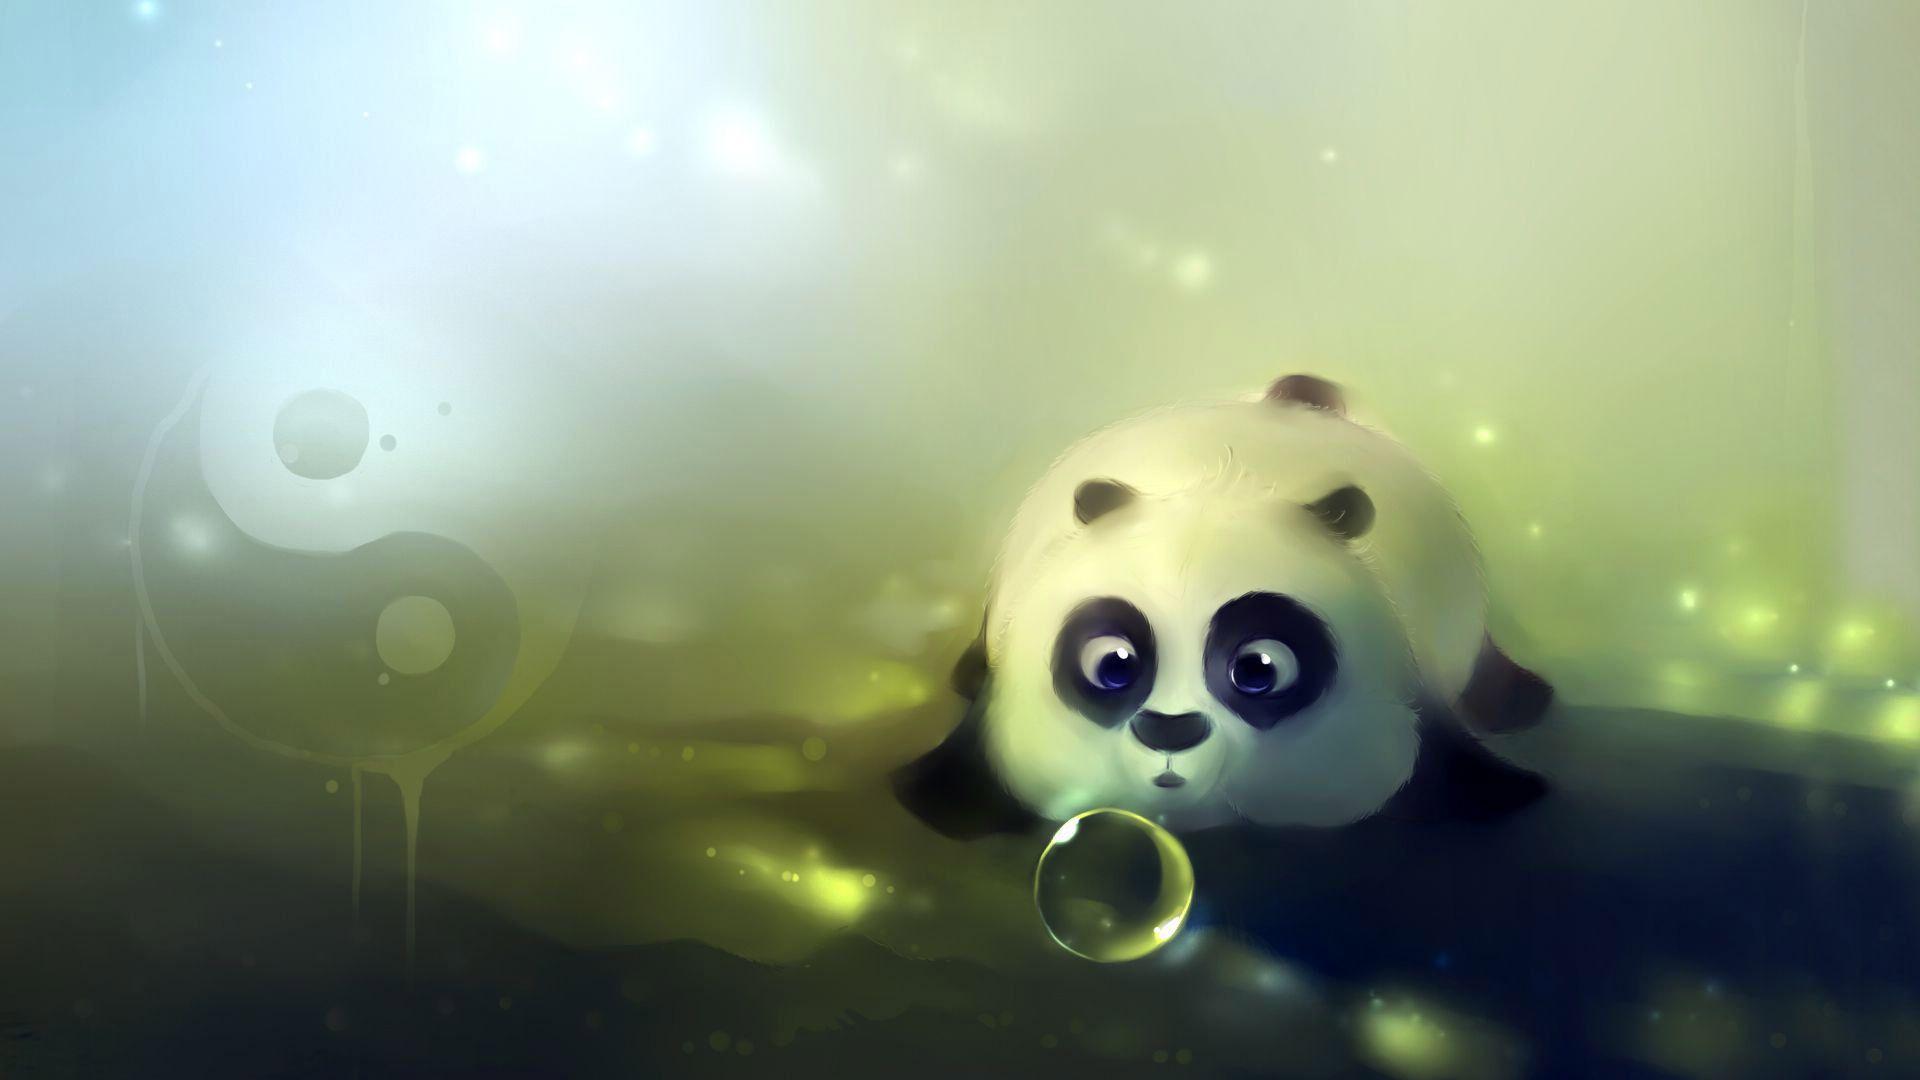 panda pictures hd wallpapers -#main